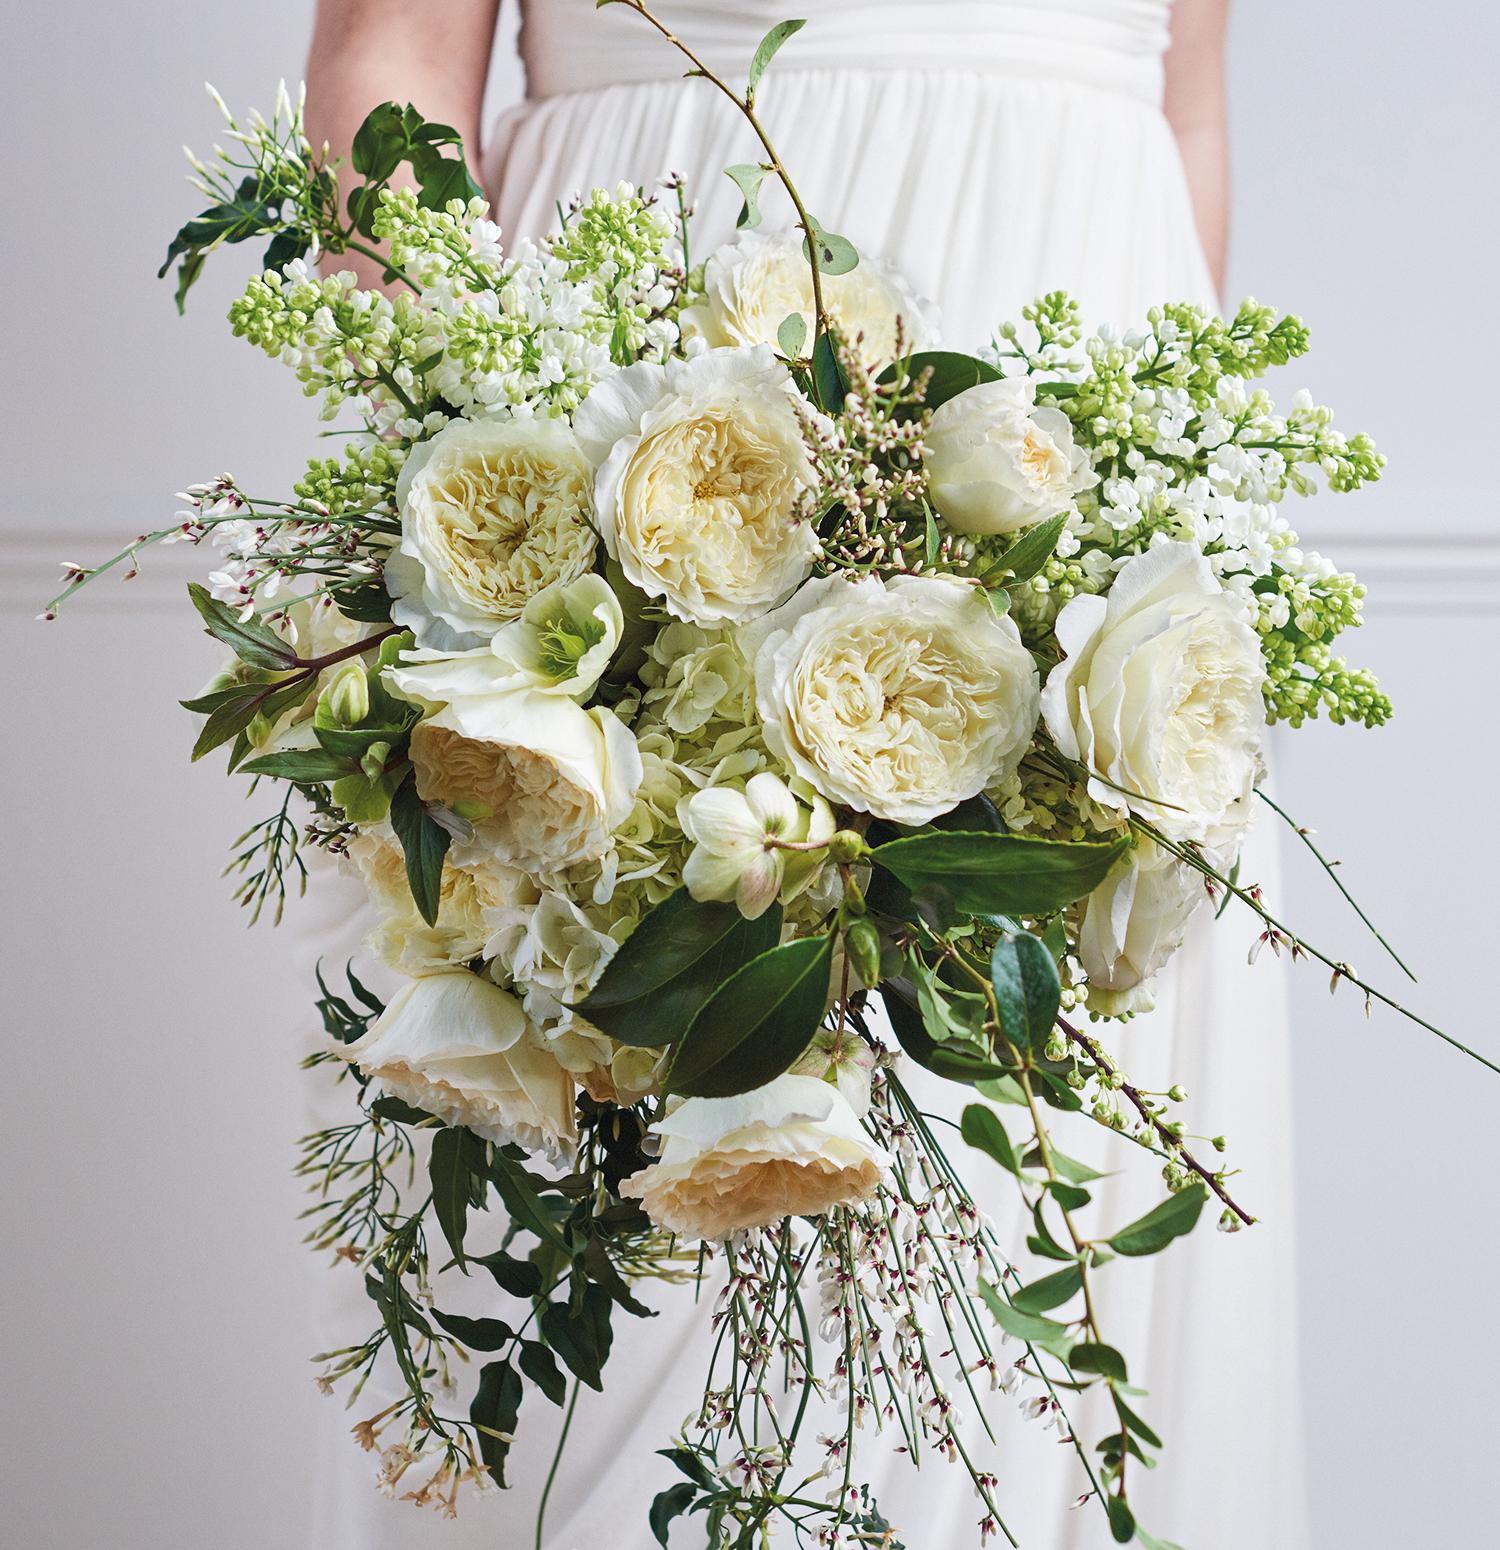 Patience cream roses wedding bouquet design